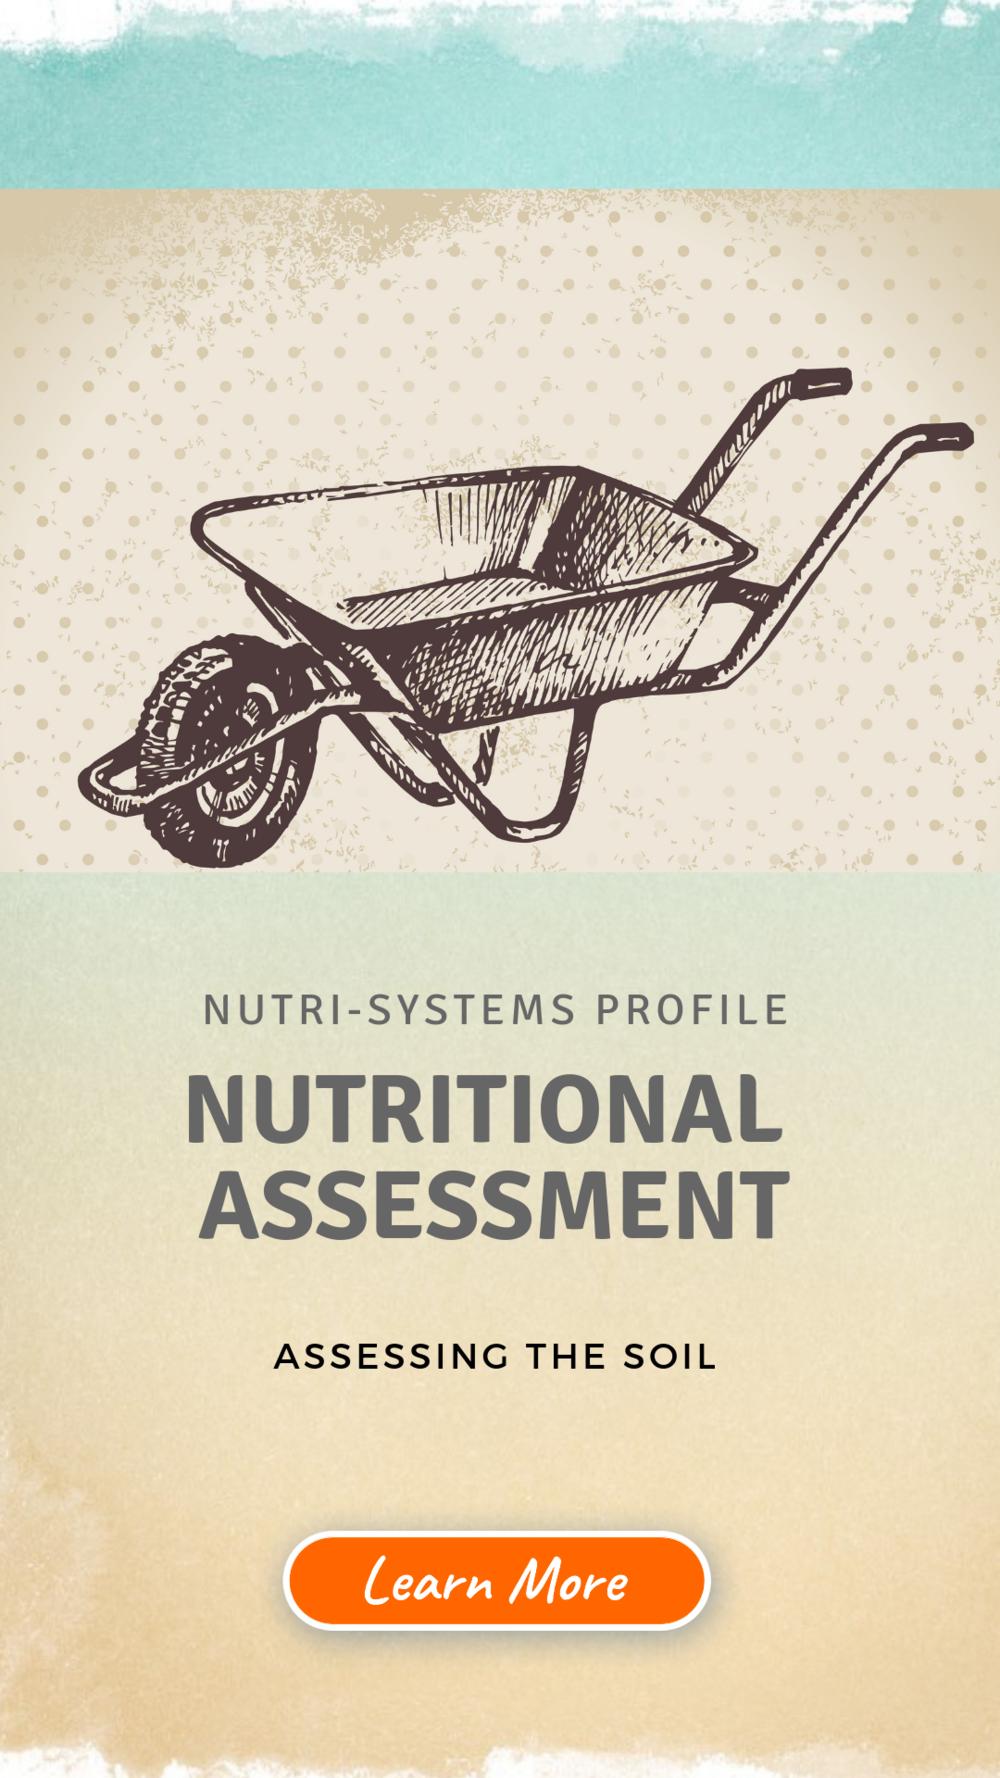 IG Story - NSP Nutritional Assessment.png